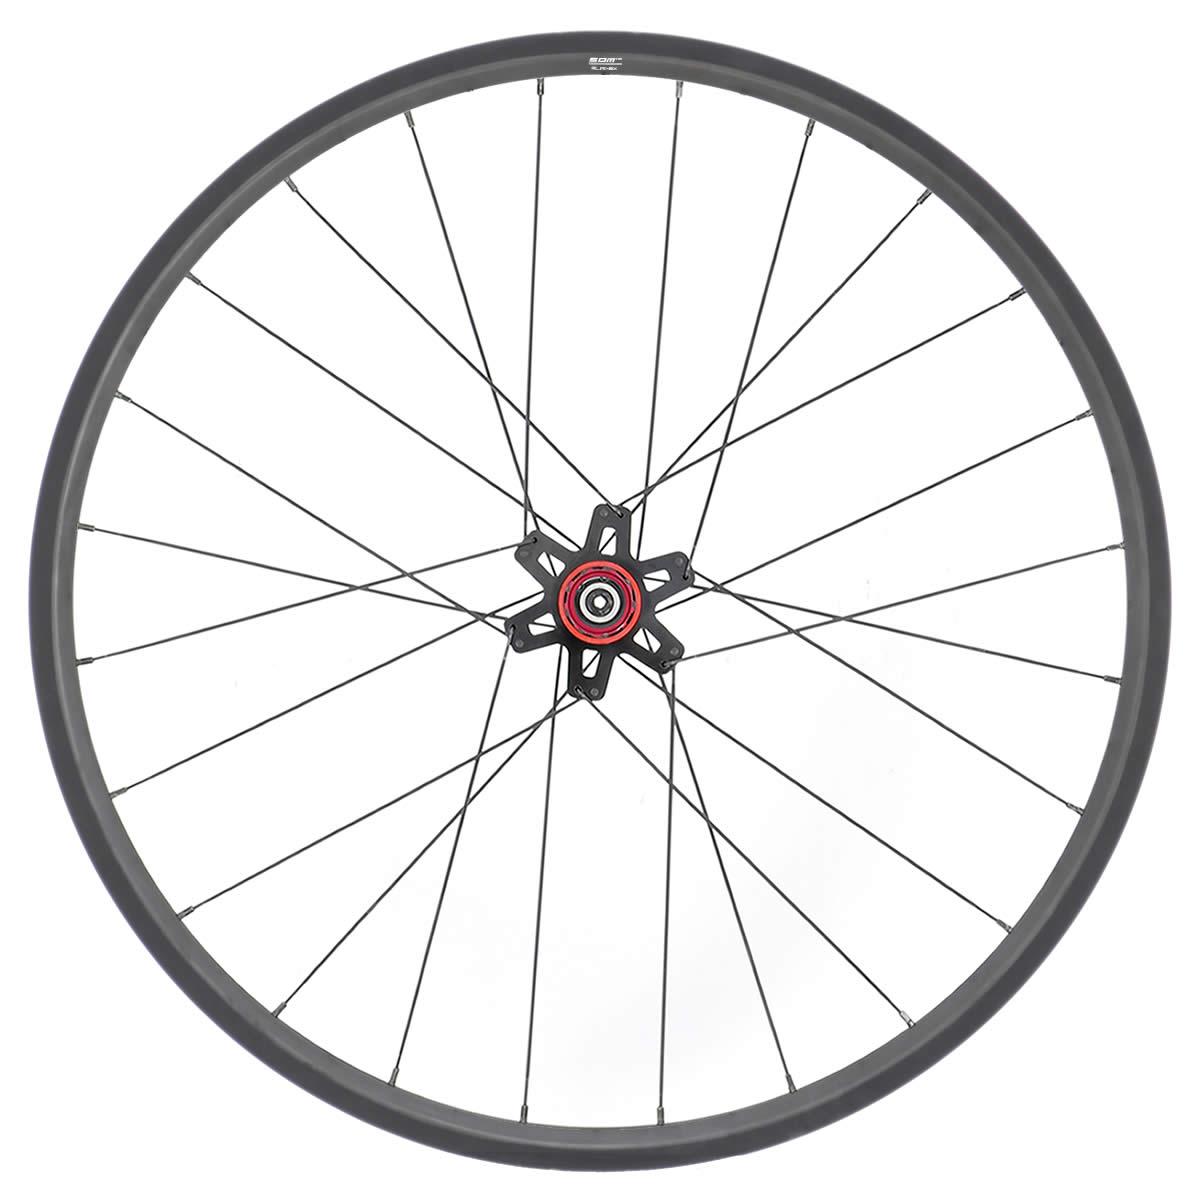 Custom Your SDM Handcrafted Carbon Road Bike Wheelset